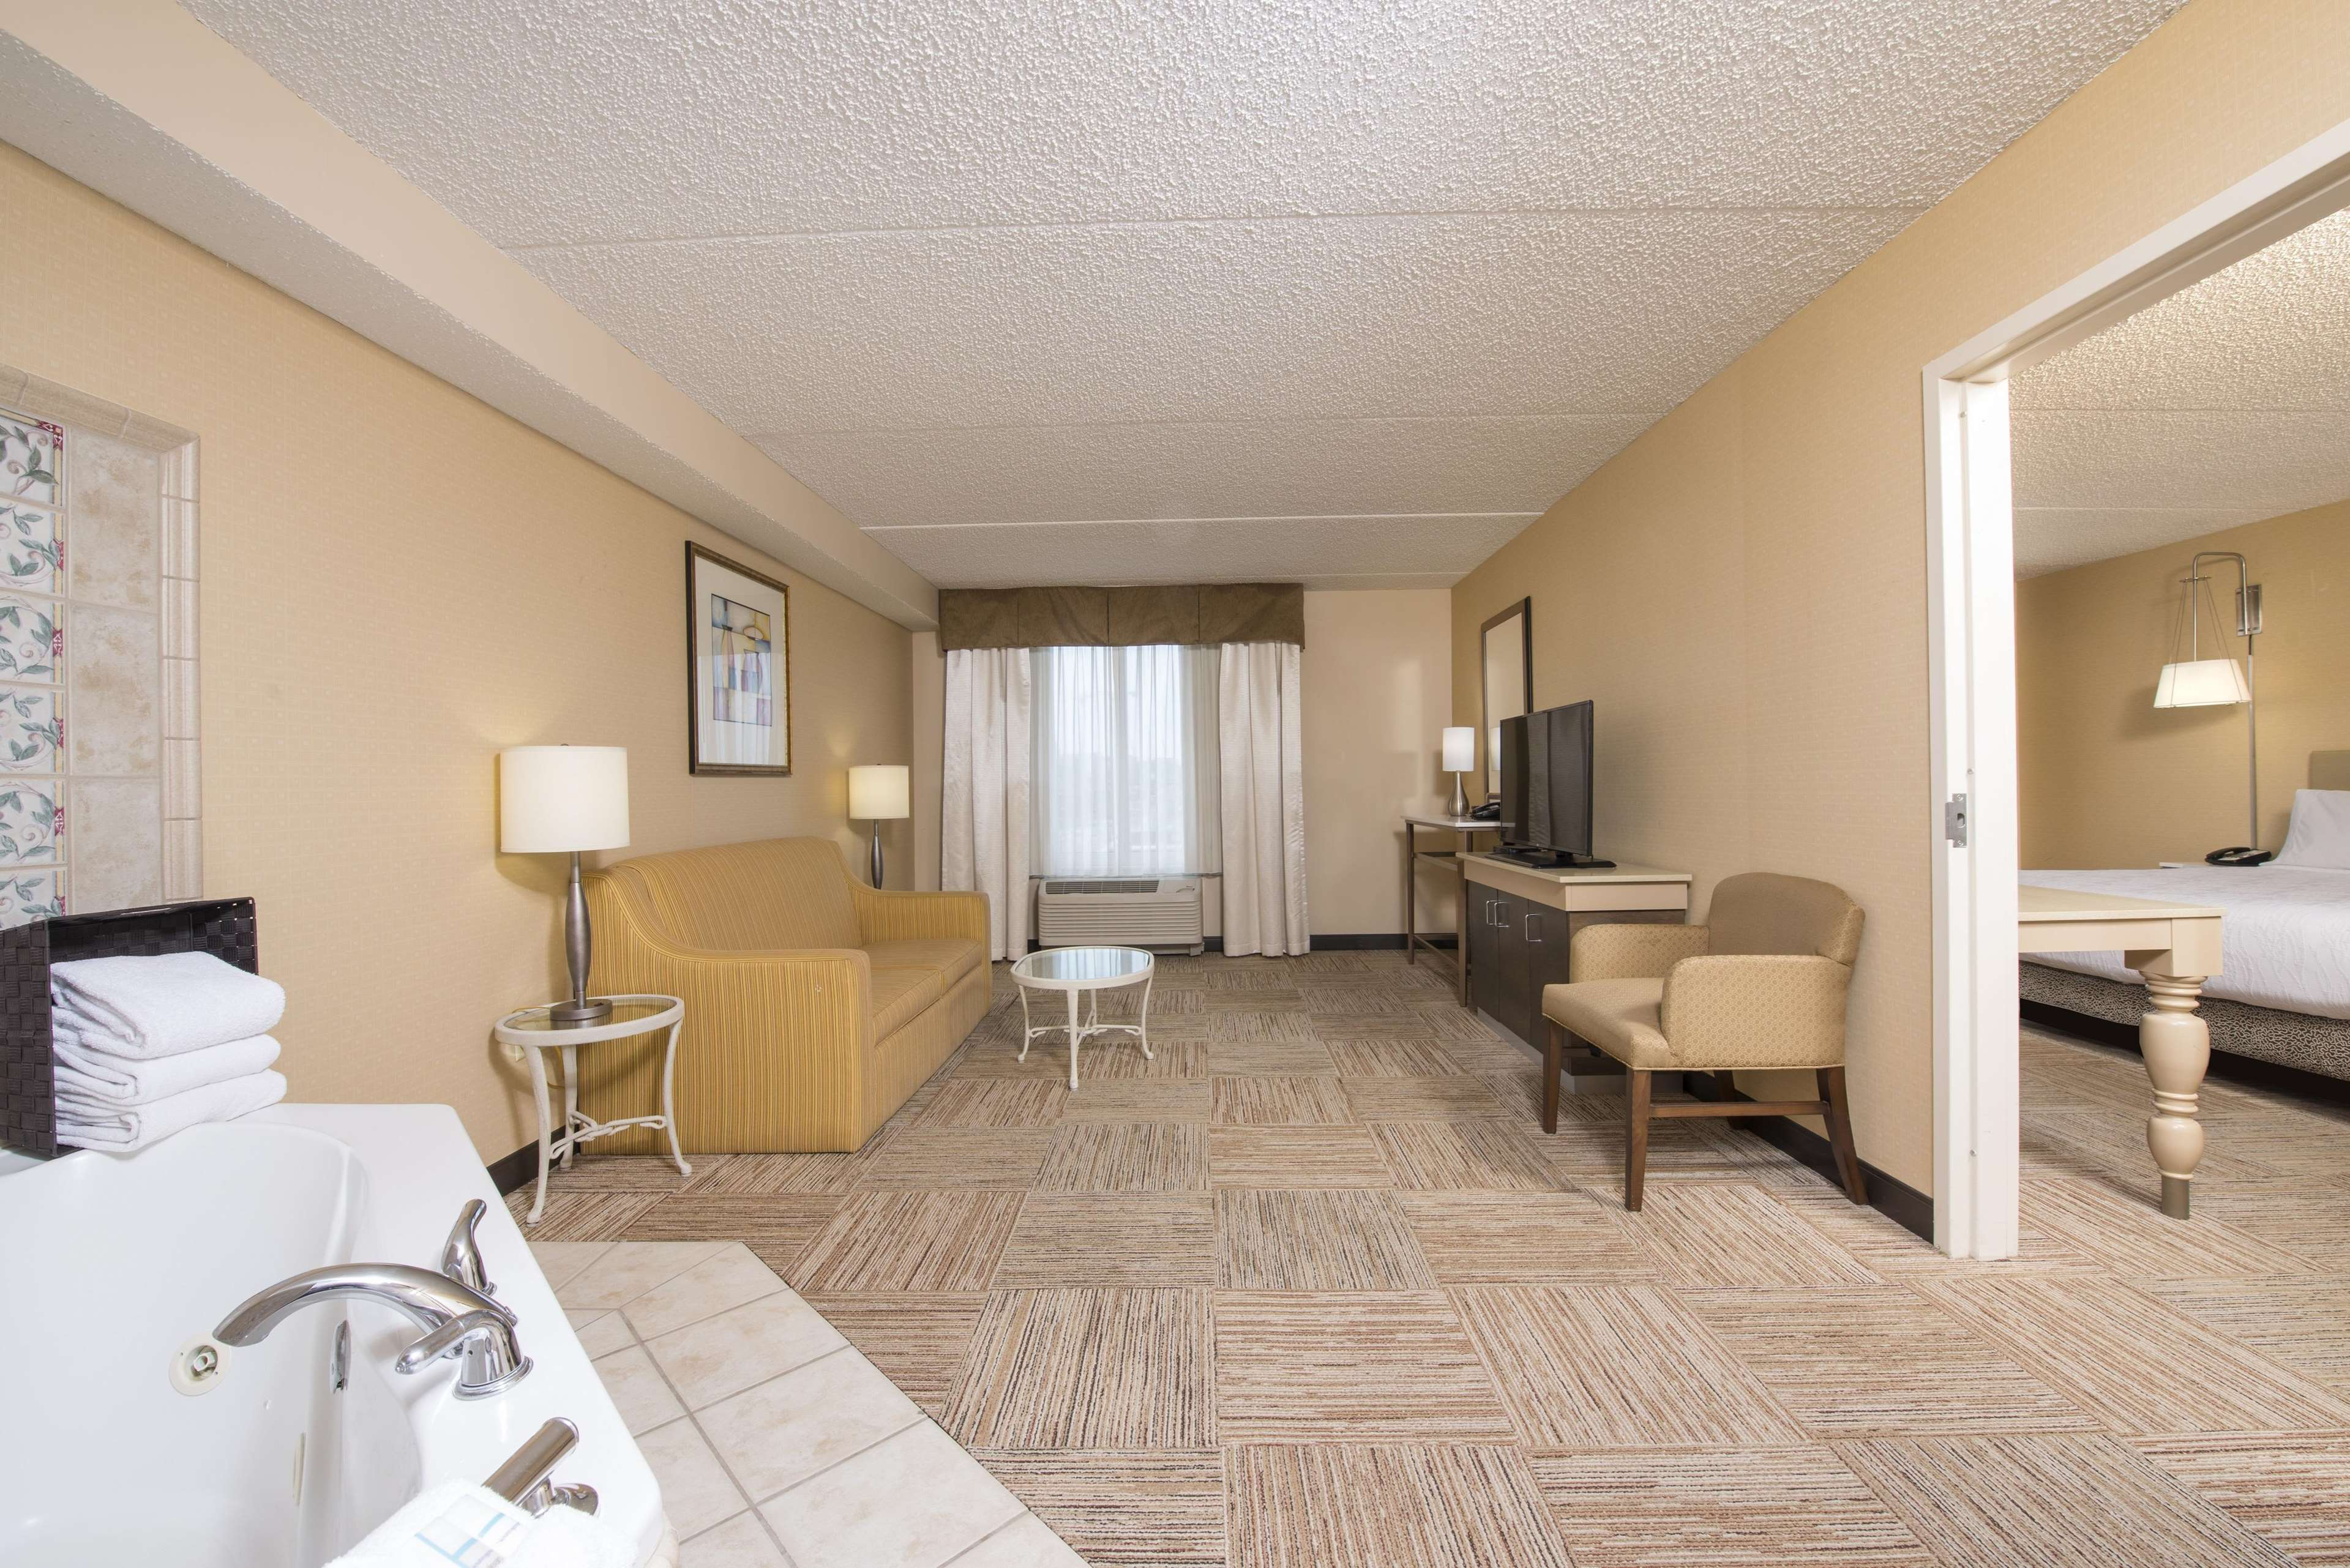 Hilton Garden Inn West Lafayette Wabash Landing image 16